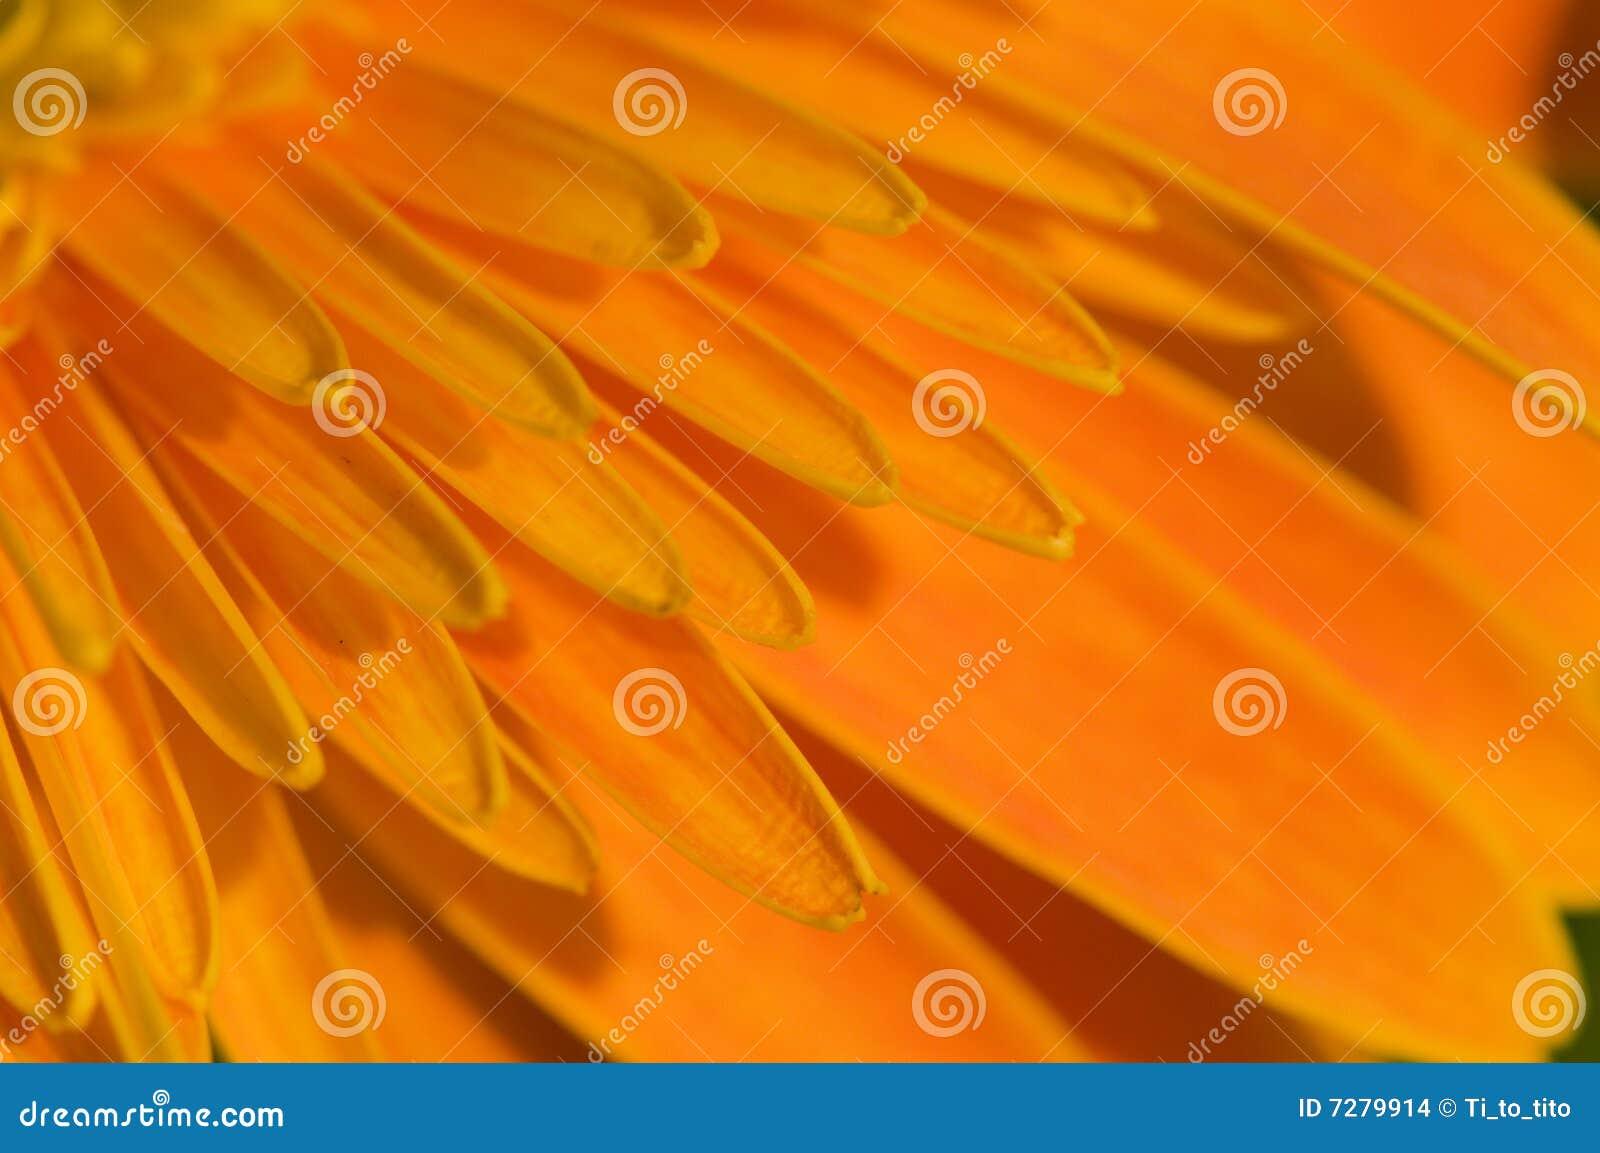 Pétalo de la margarita anaranjada